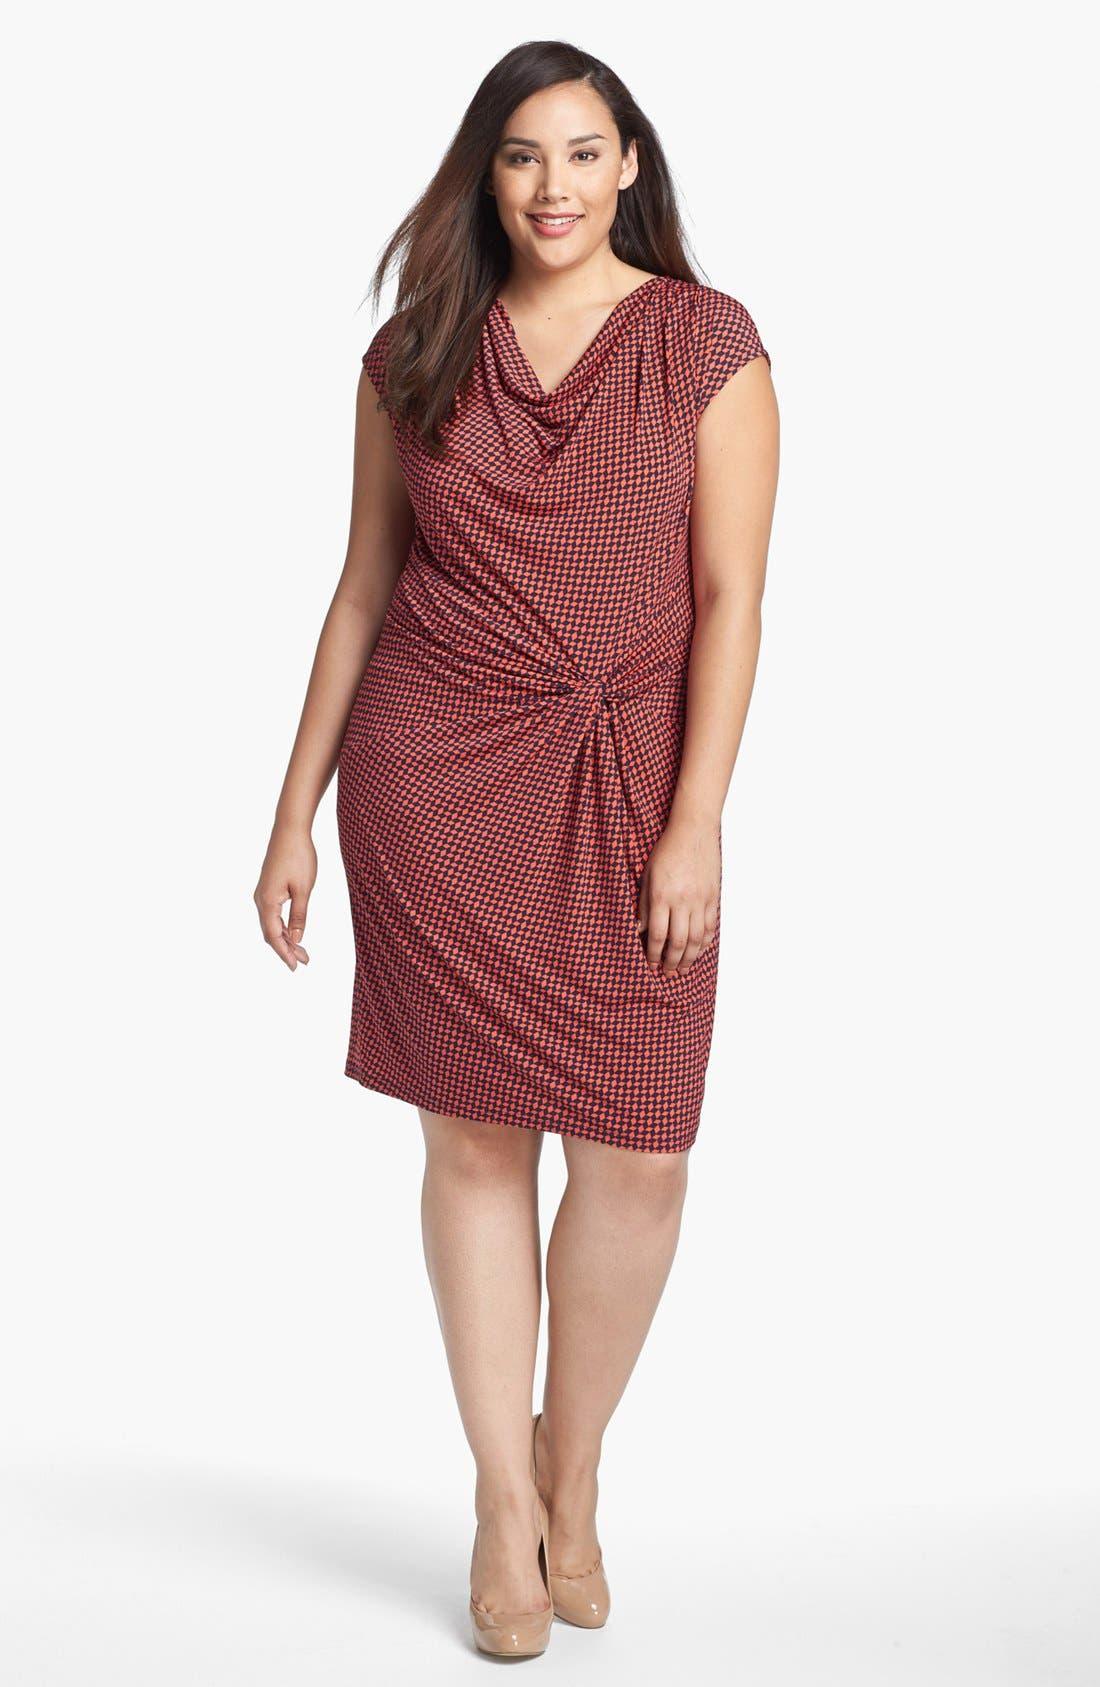 Alternate Image 1 Selected - MICHAEL Michael Kors Knotted Twist Dress (Plus Size)